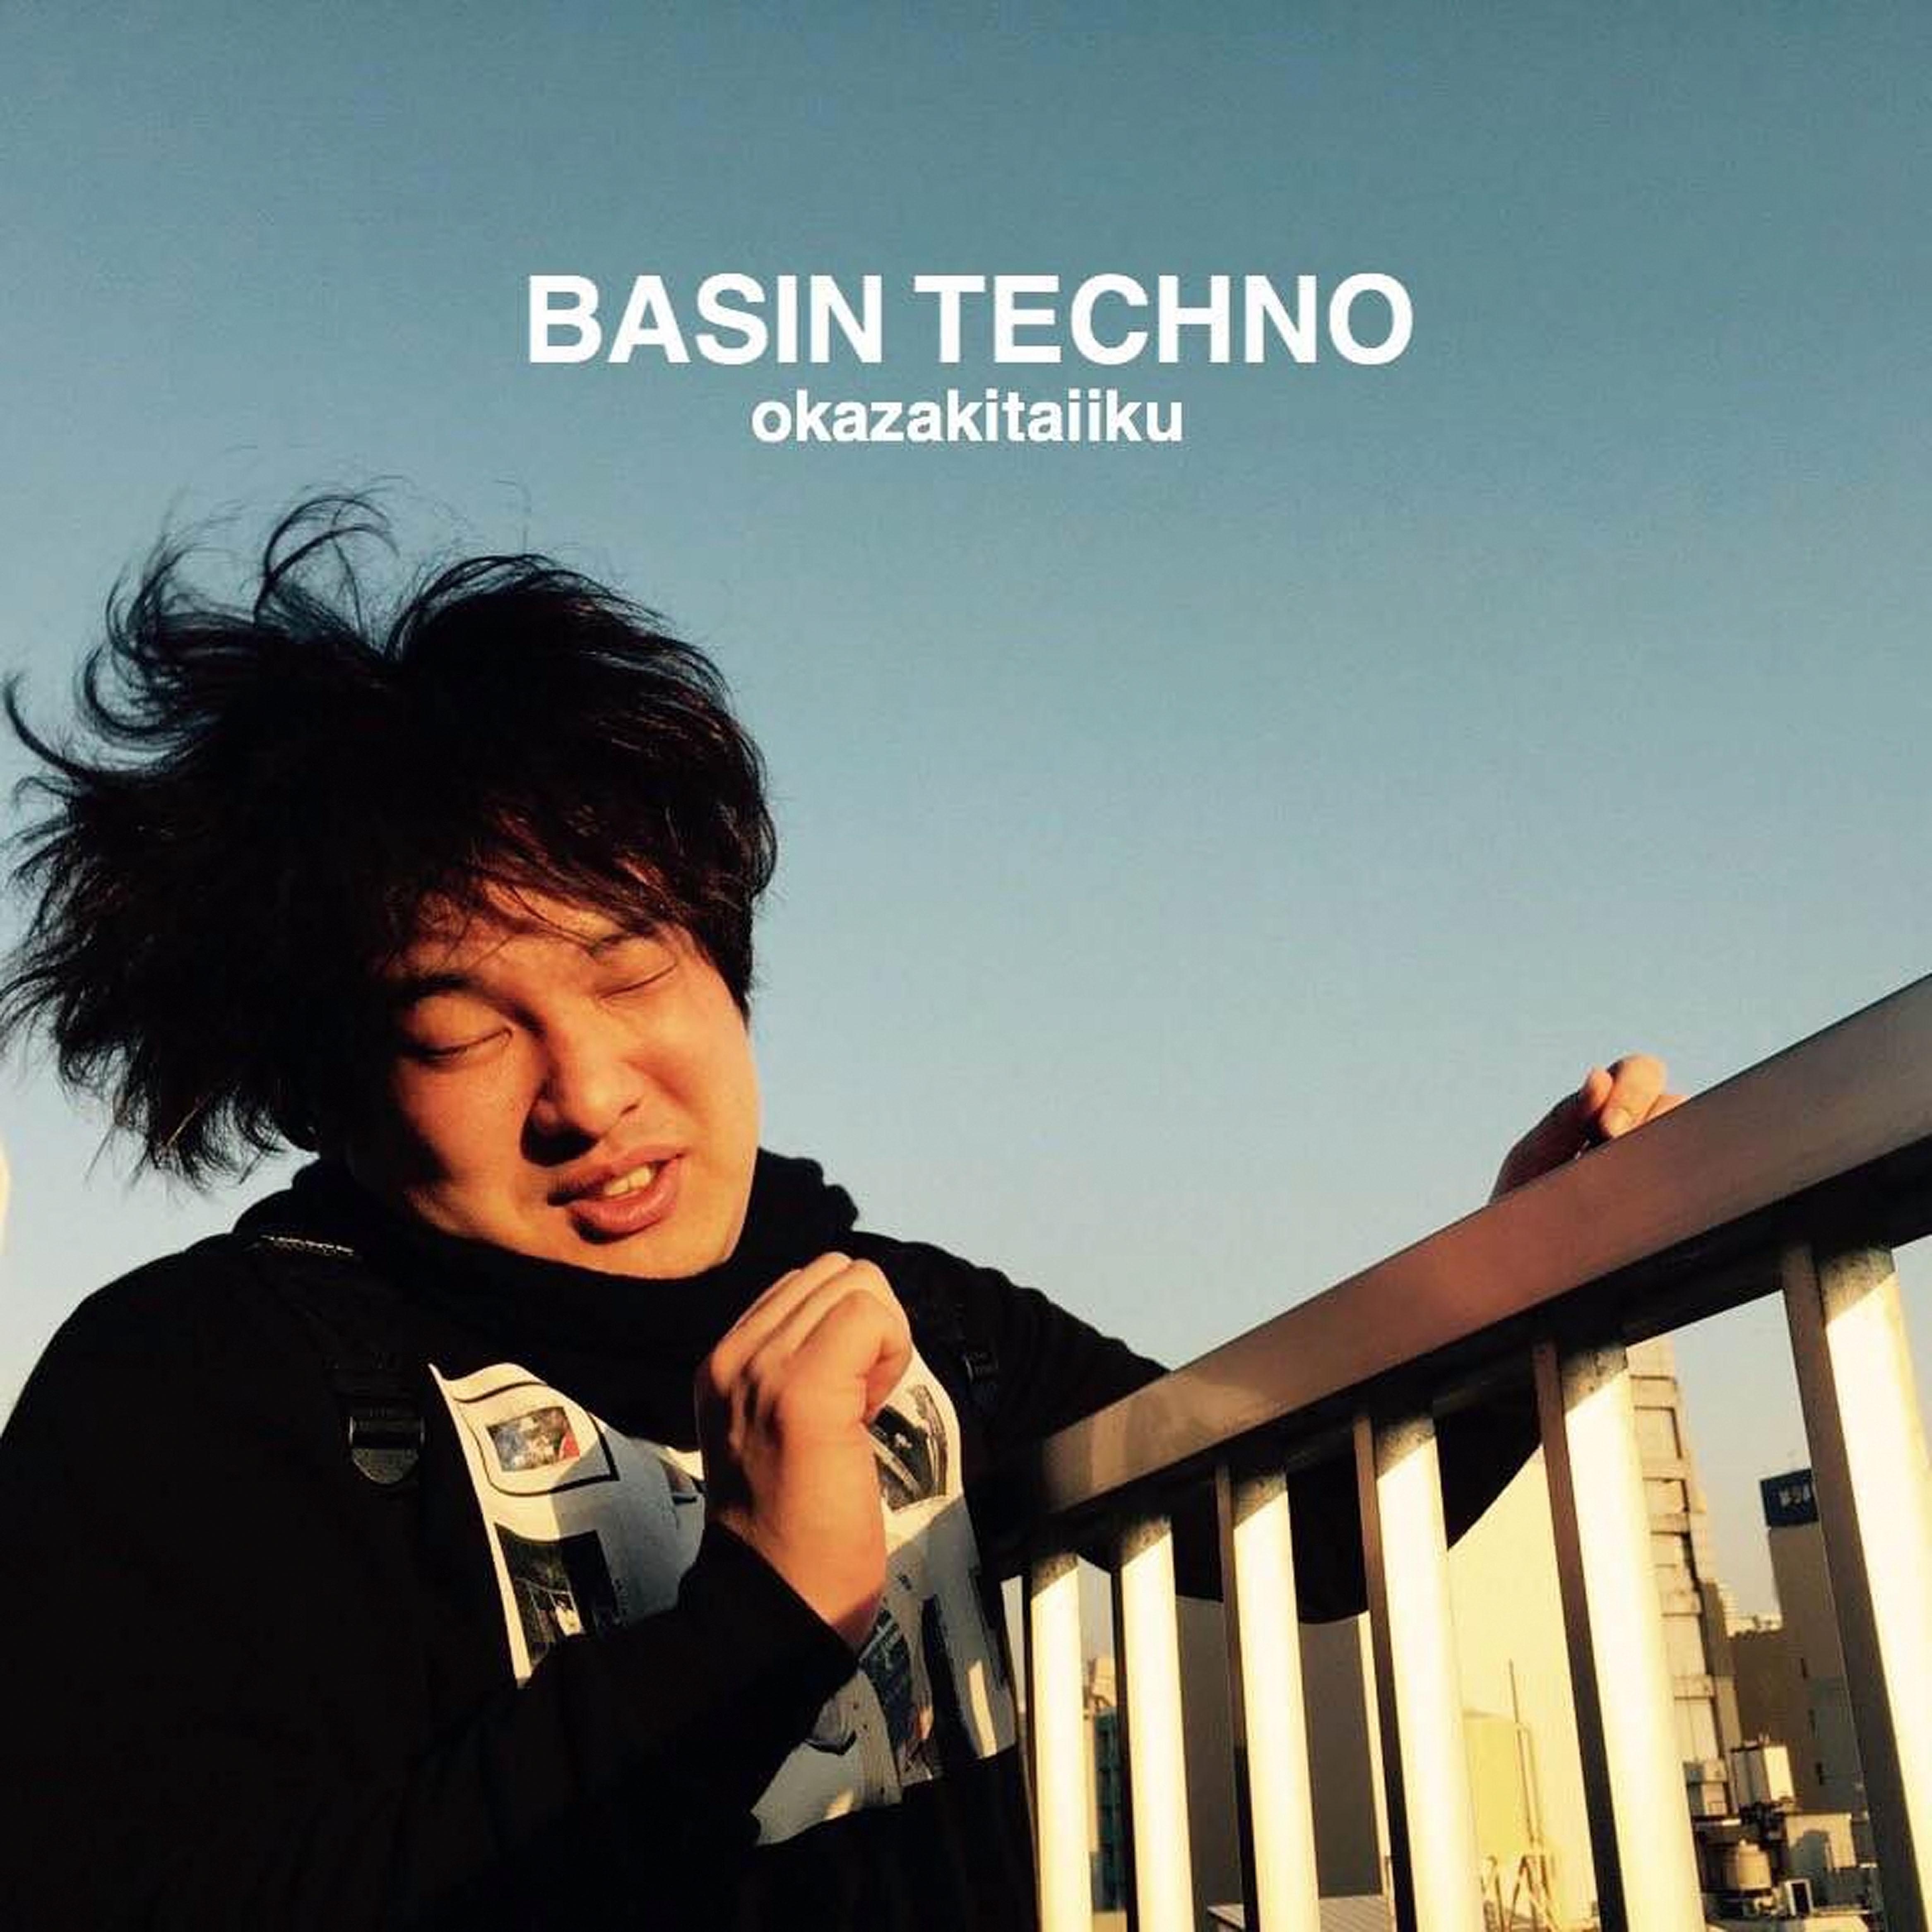 『BASIN TECHNO』岡崎体育 / SECL-1881 (2016/5/18)